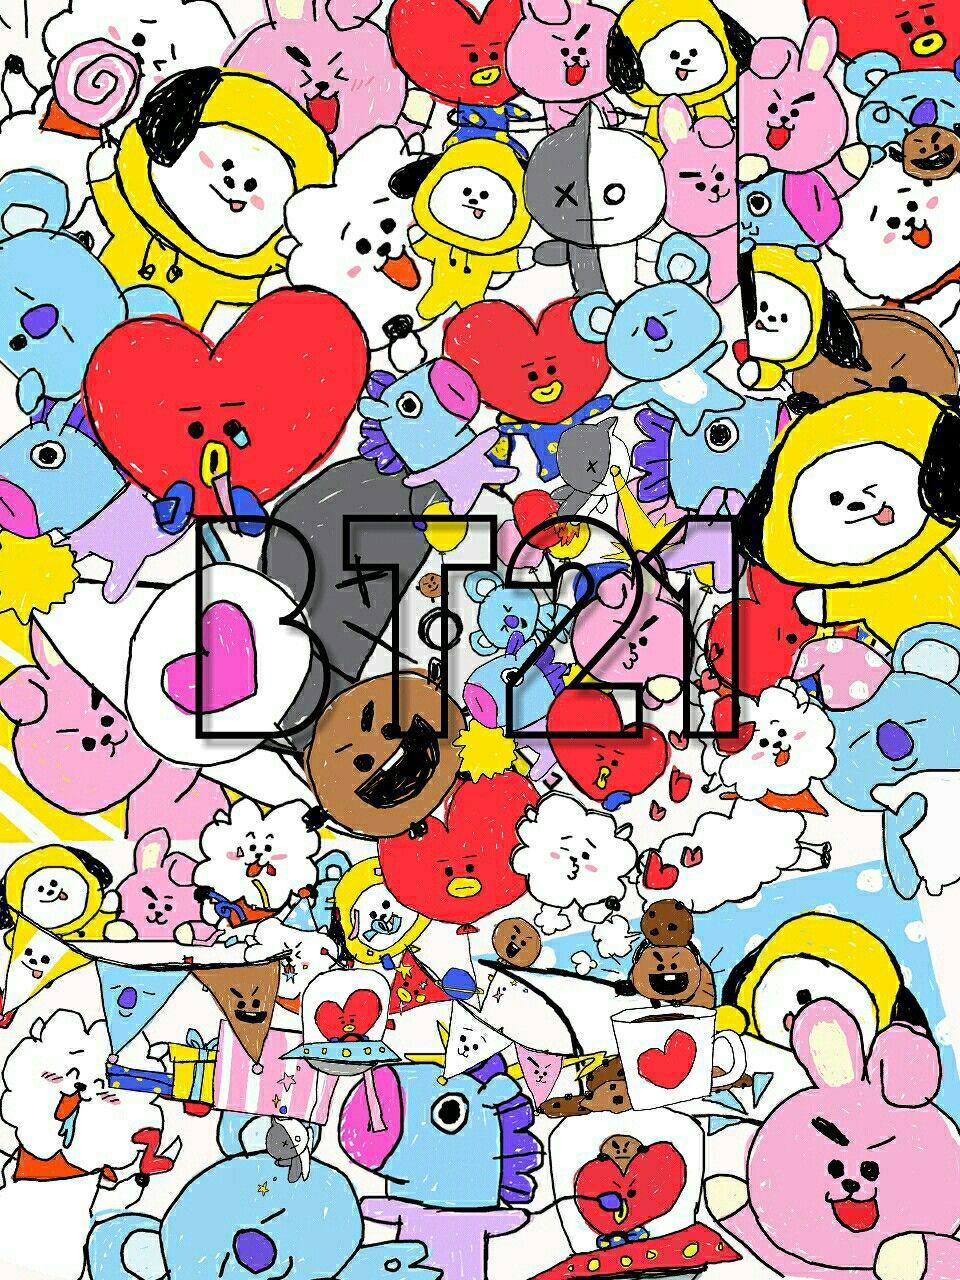 Bts, BT21, wallpapers, background. BTS Pinterest